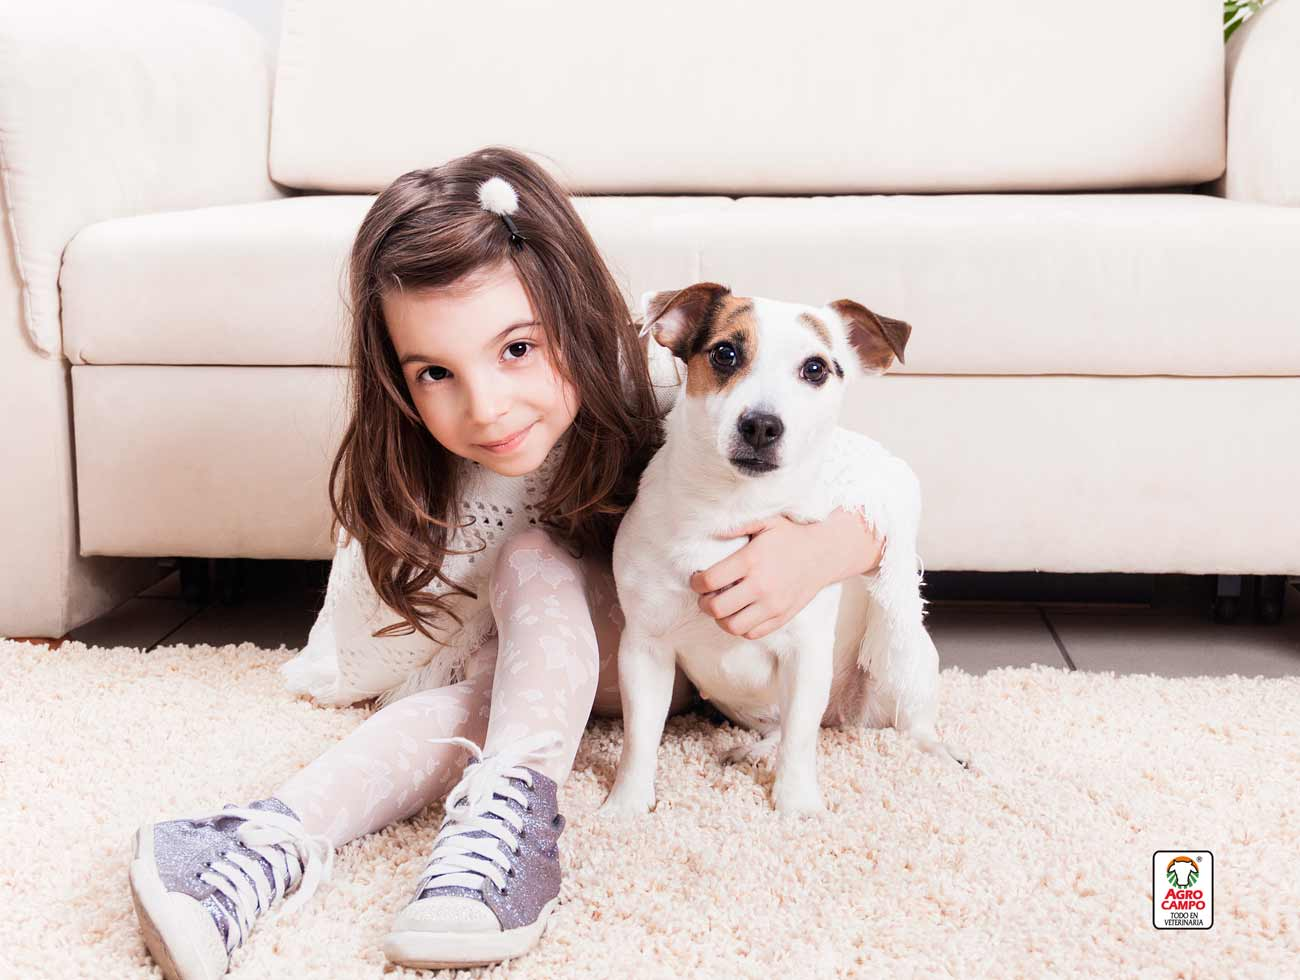 jack-russell-perro-caracteristicas